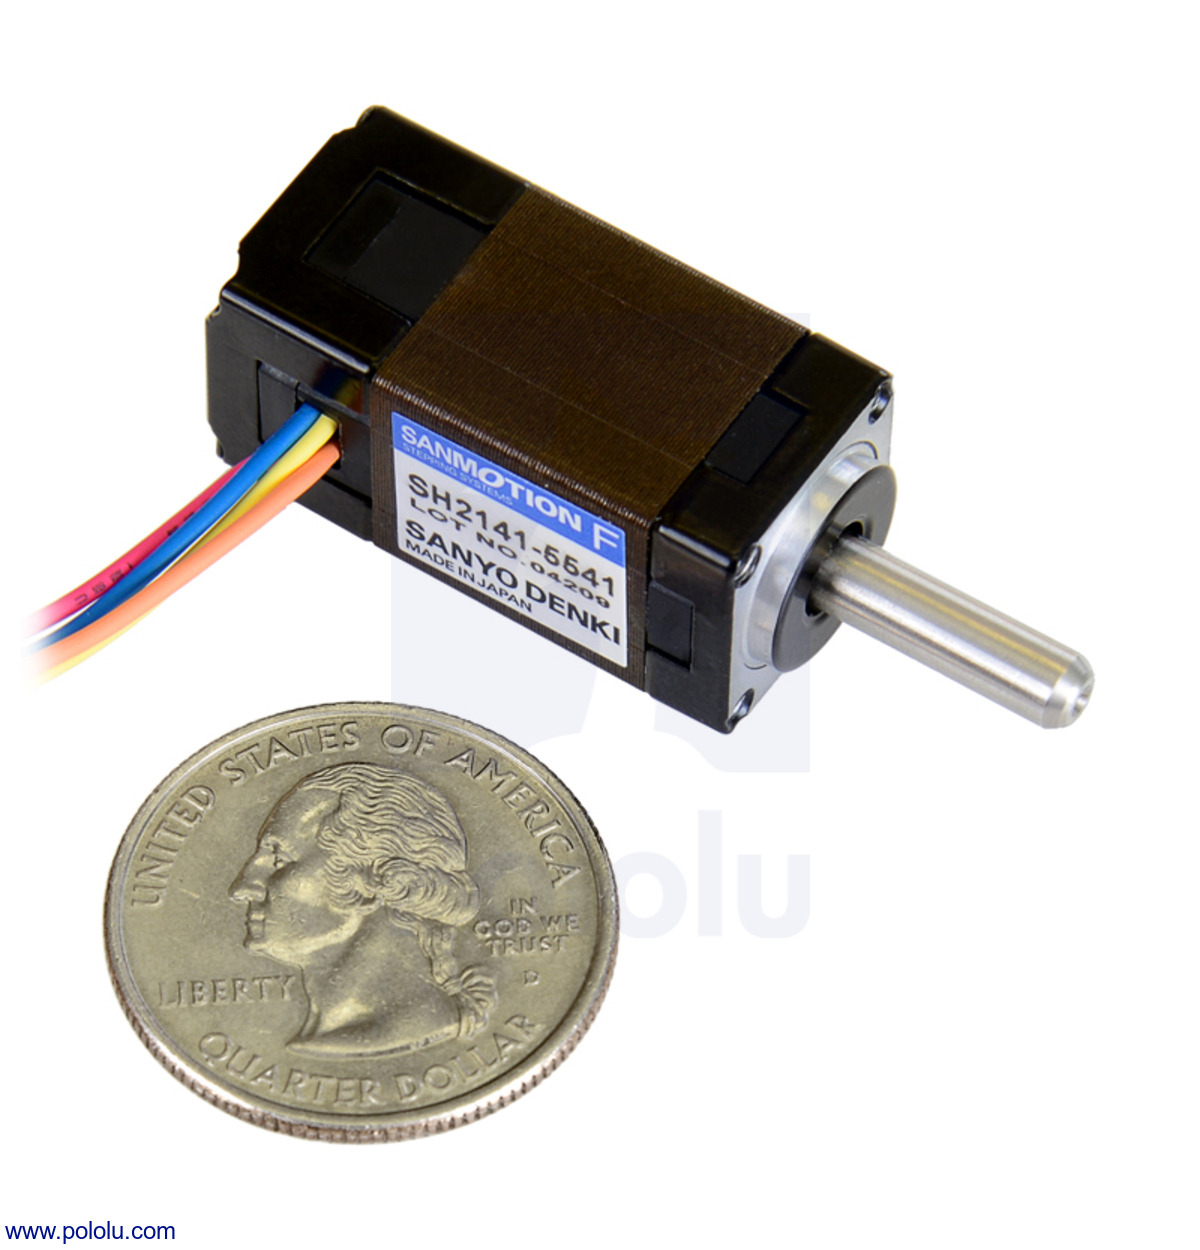 Pololu Sanyo Miniature Stepper Motor Bipolar 200 Steps Rev 14 5 Phase Wiring Diagram New